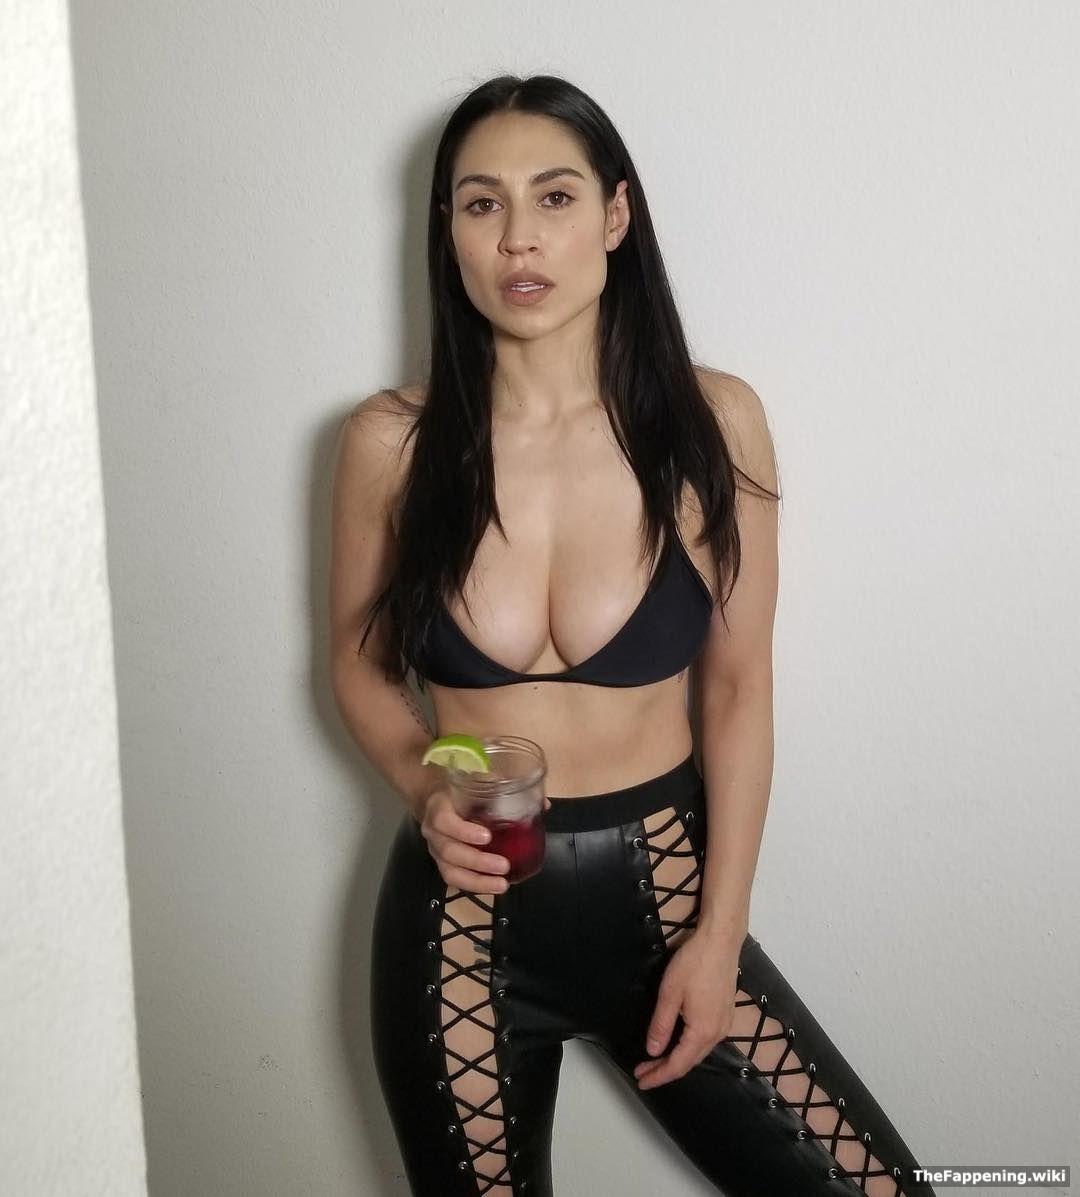 Hot busty girls pics